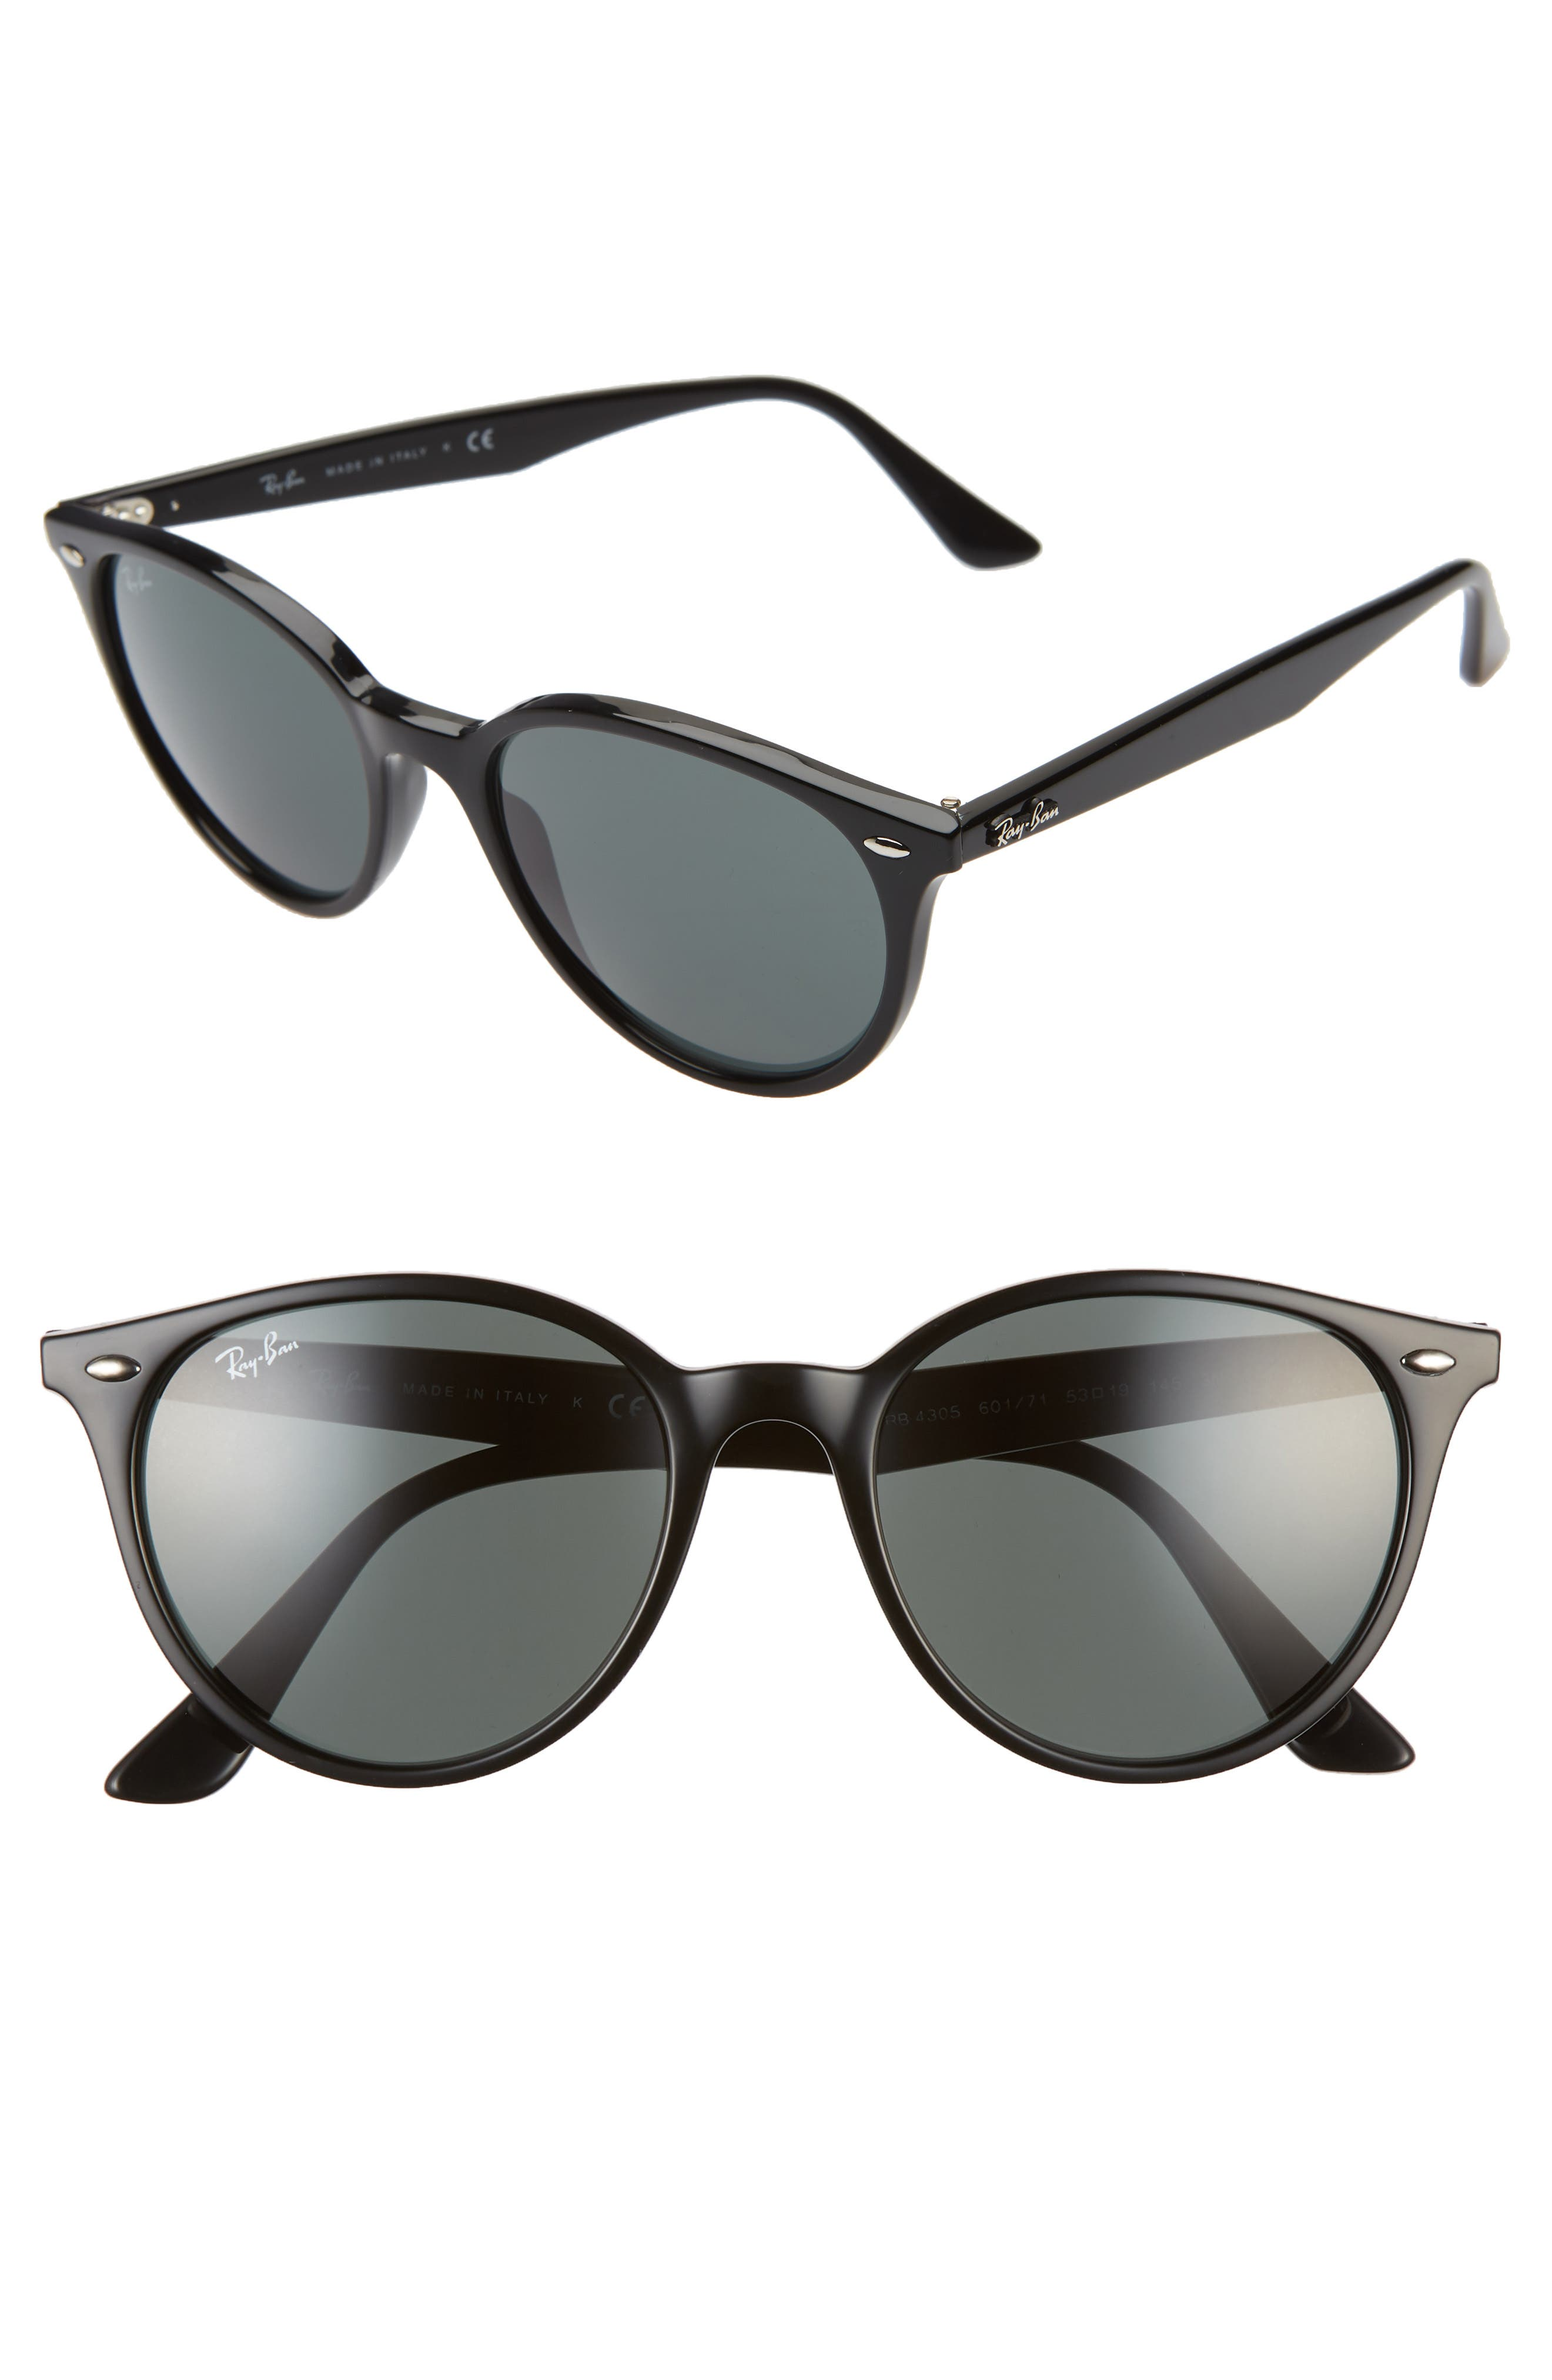 Ray-Ban Phantos 5m Round Sunglasses - Black/ Green Solid